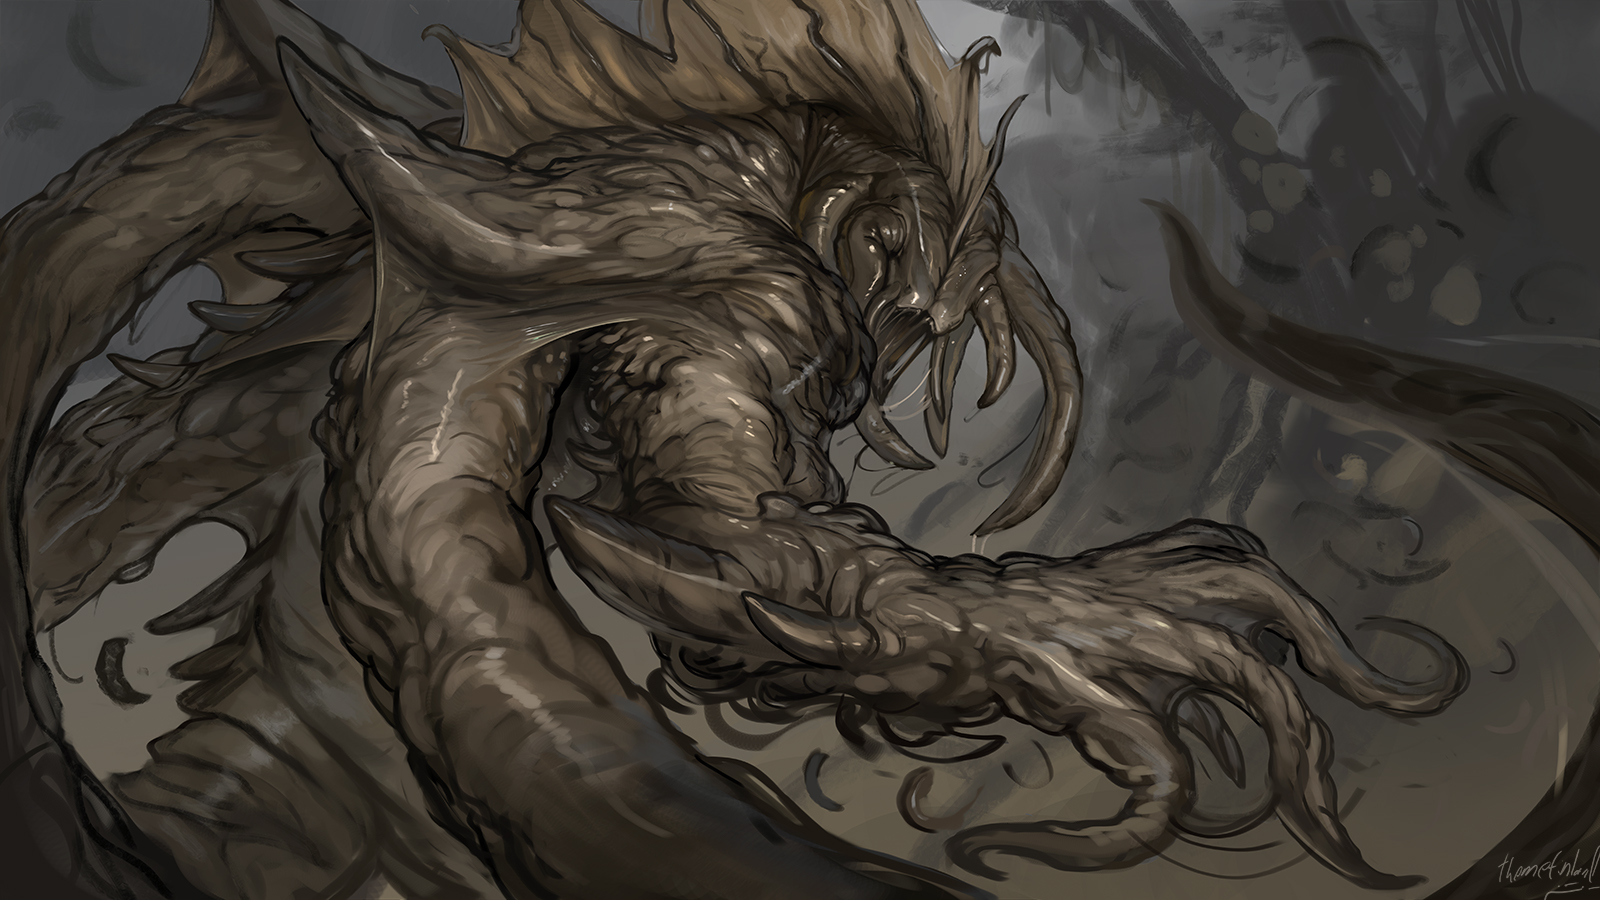 Larval horror [commission]